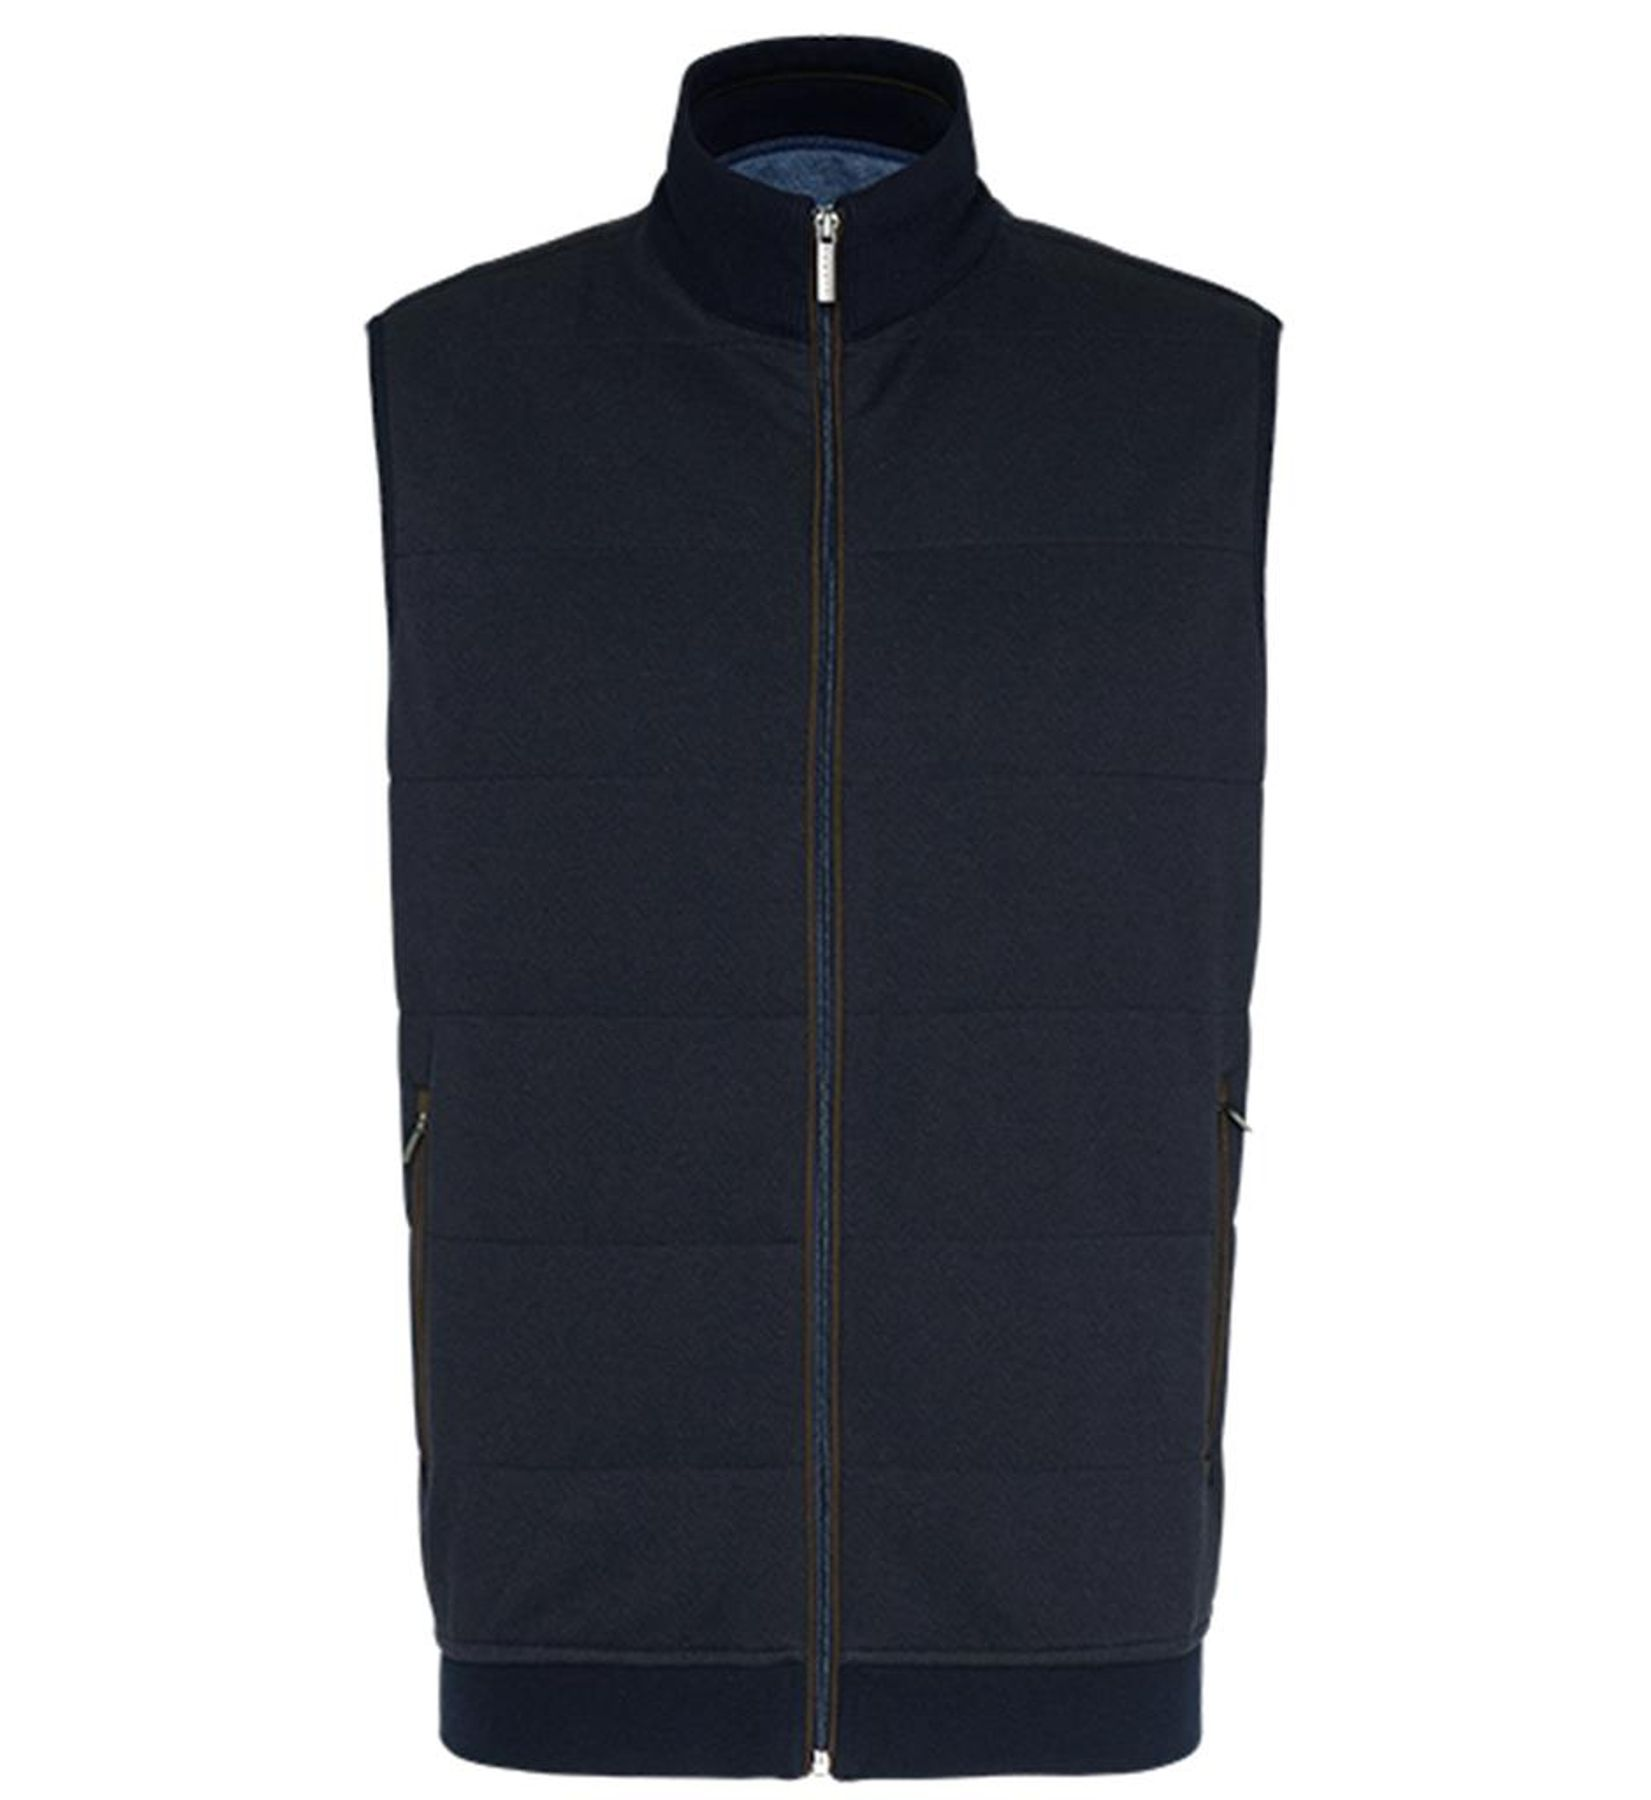 Bugatti - Herren Sweatshirt Weste (Art. Nr.: 25060-8850)